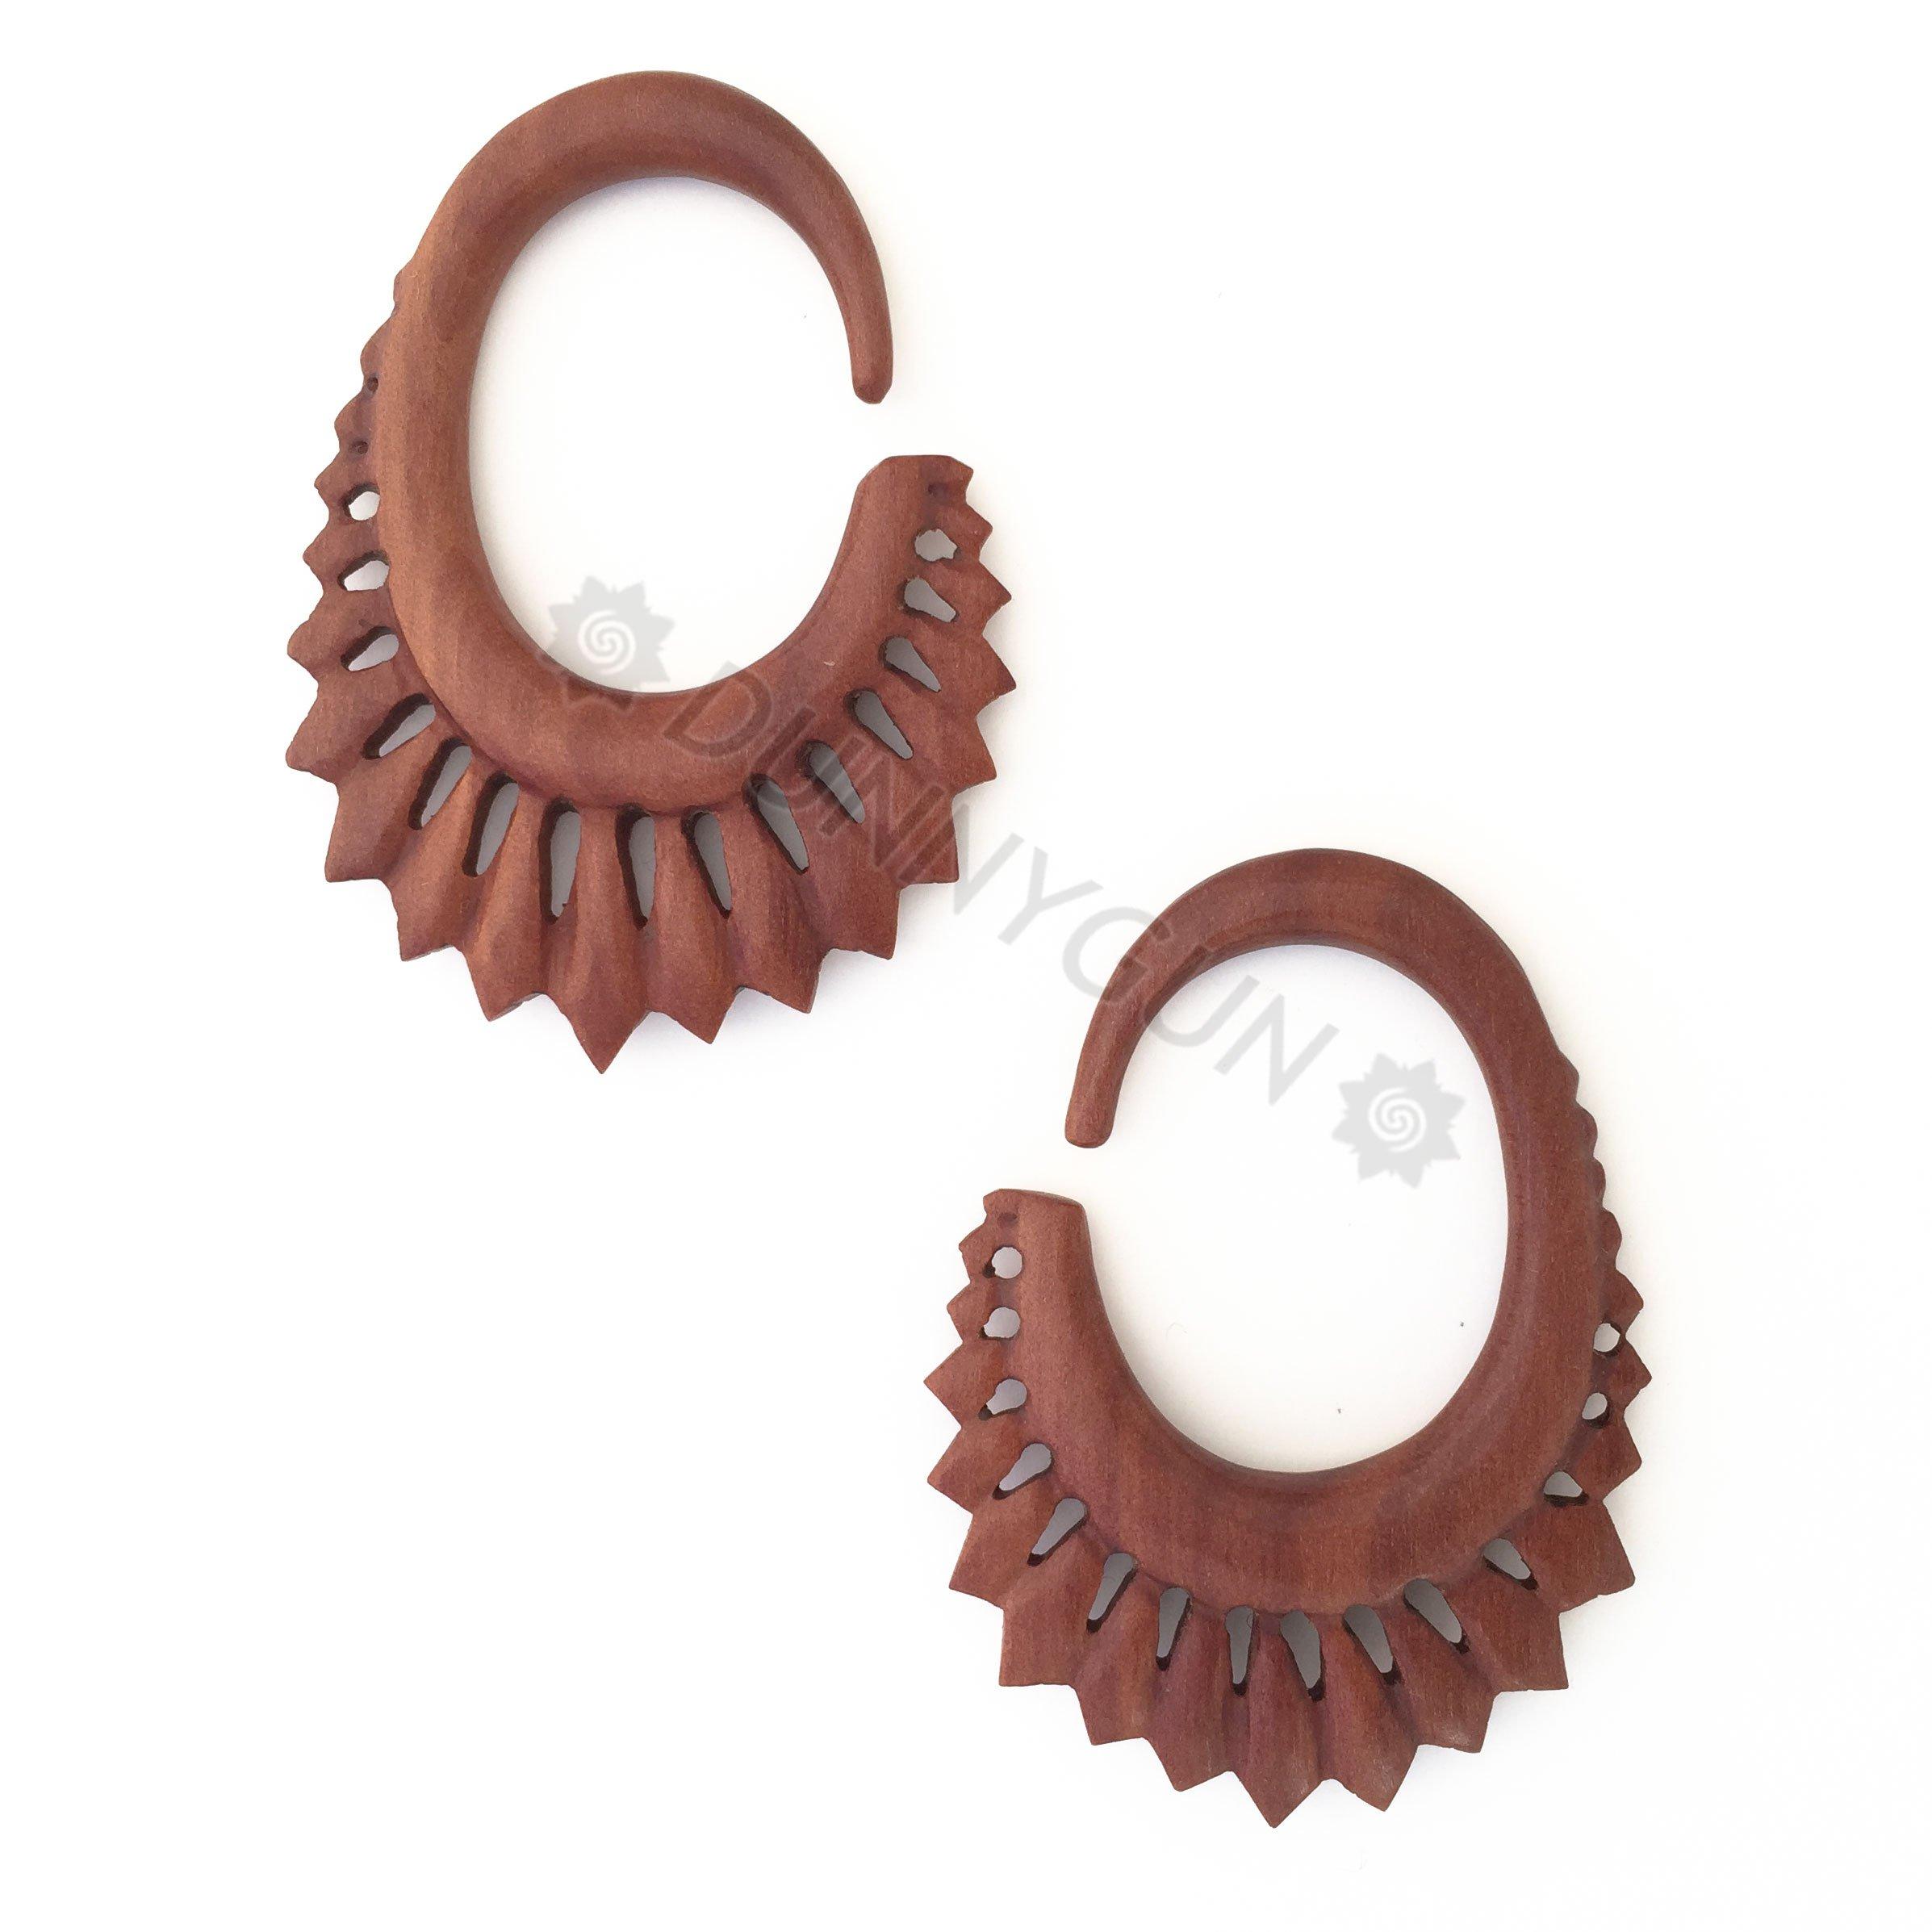 6G Pair Red Saba Wood Short Quiver Spiral Gauged Earring Plugs 6 Gauge Dunnygun Body Piercing Jewelry